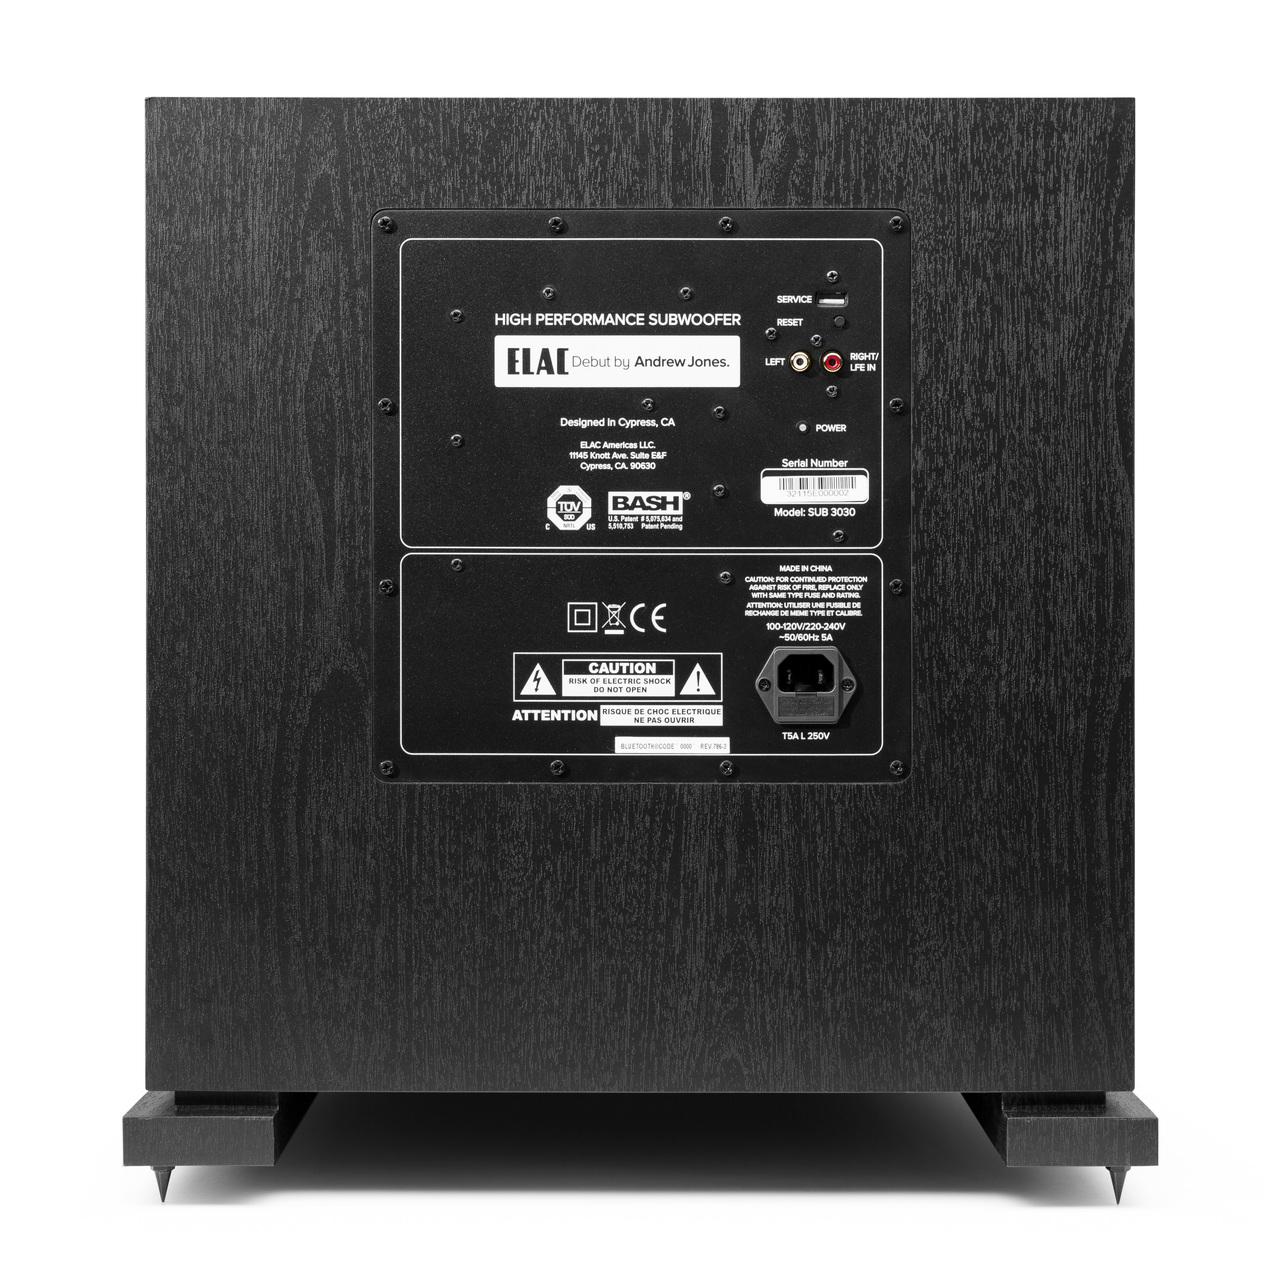 "ELAC 1000 Watt, 12"" power subwoofer. True Audiophile Store."